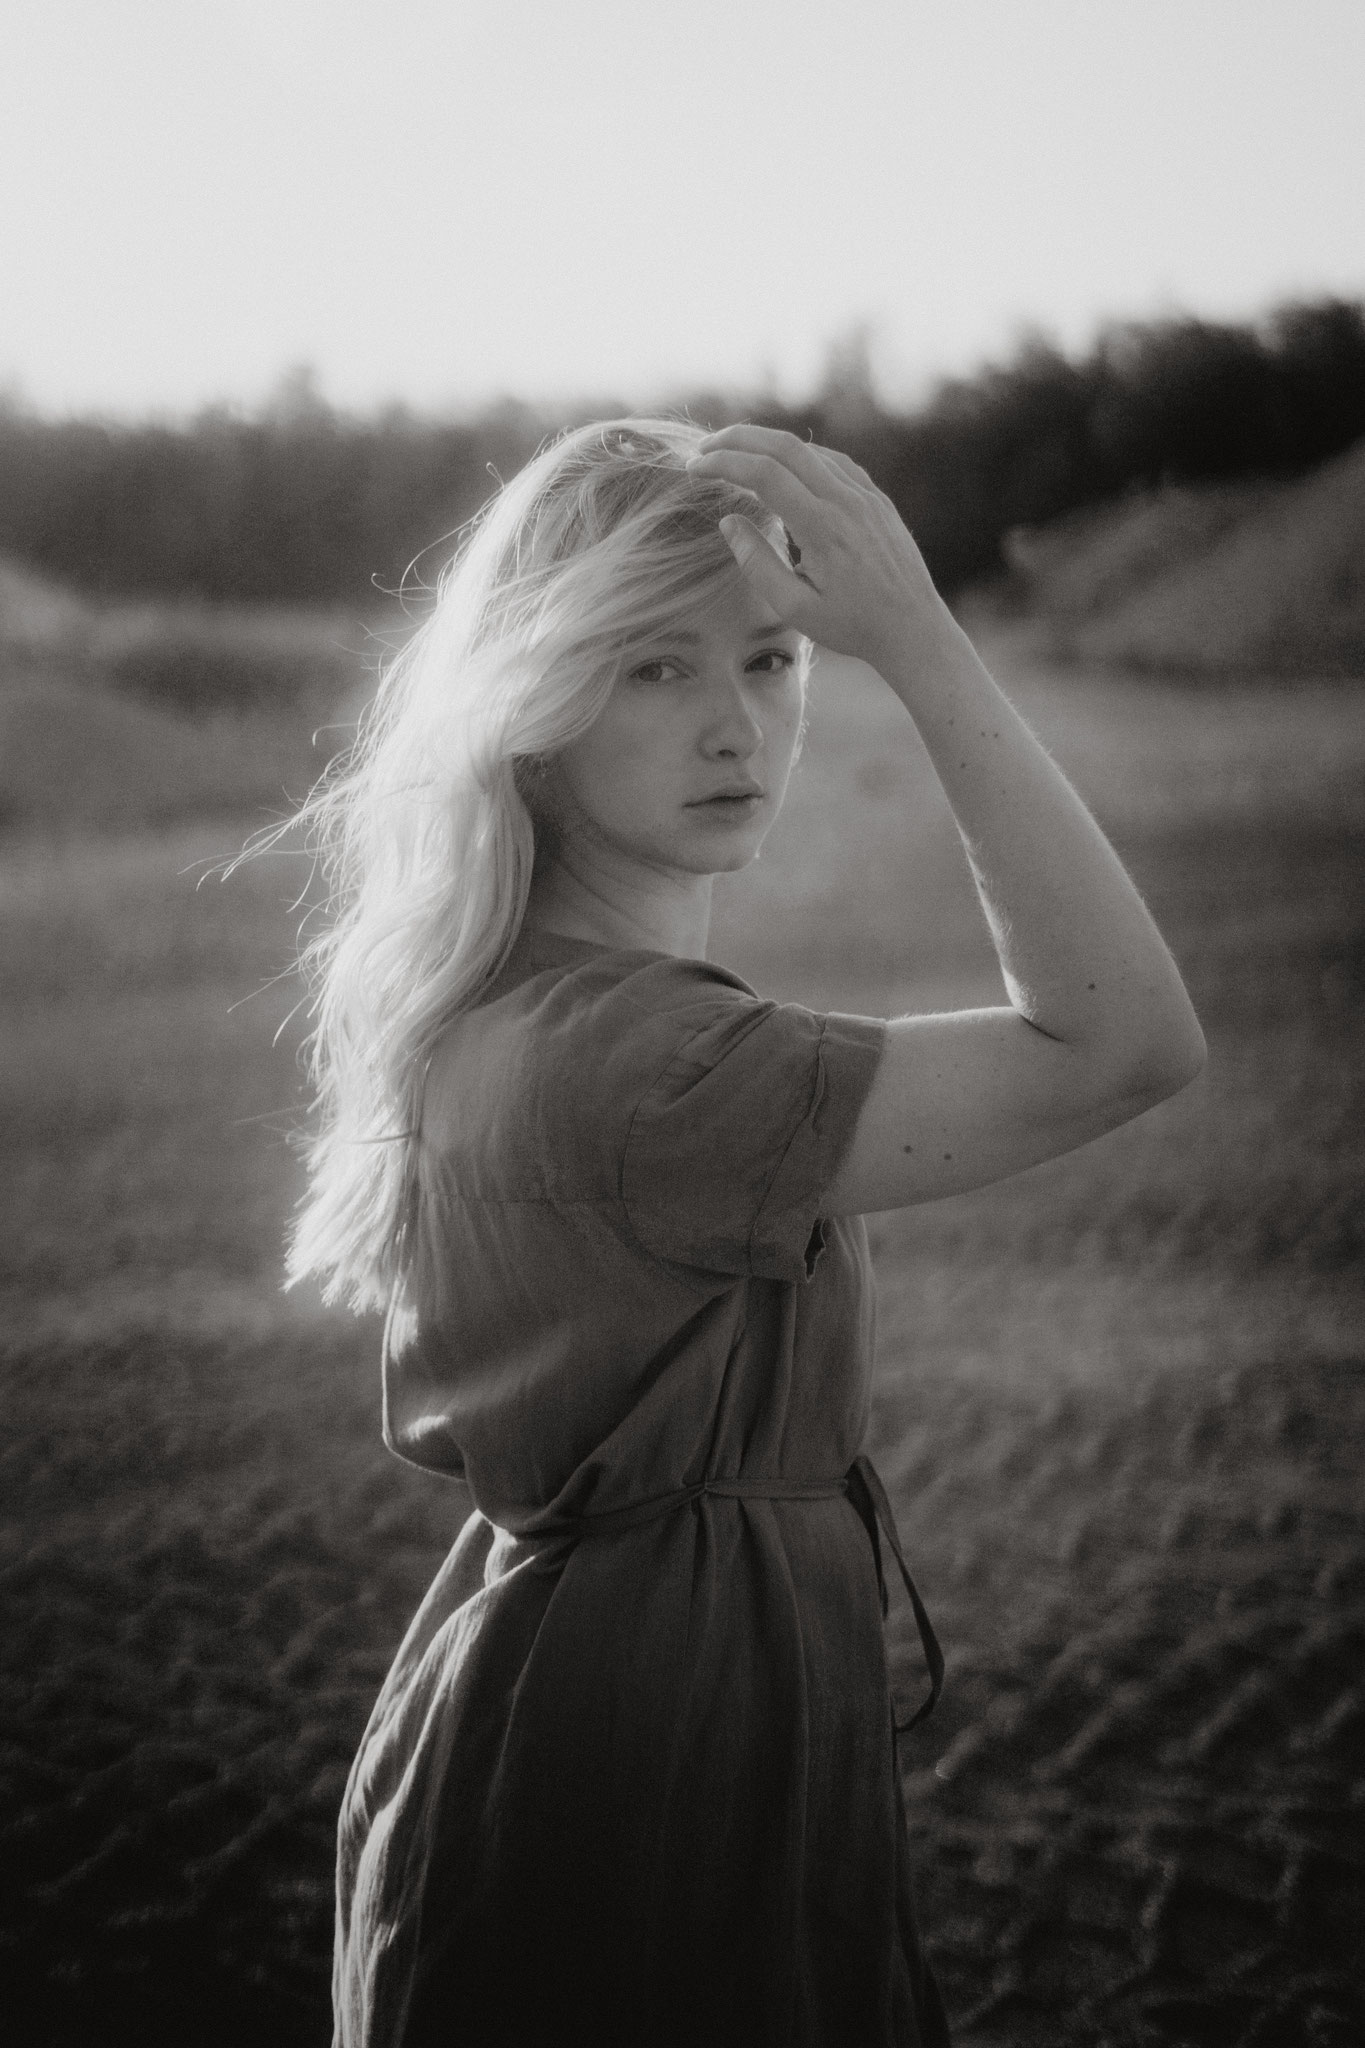 © Luise Blumstengel